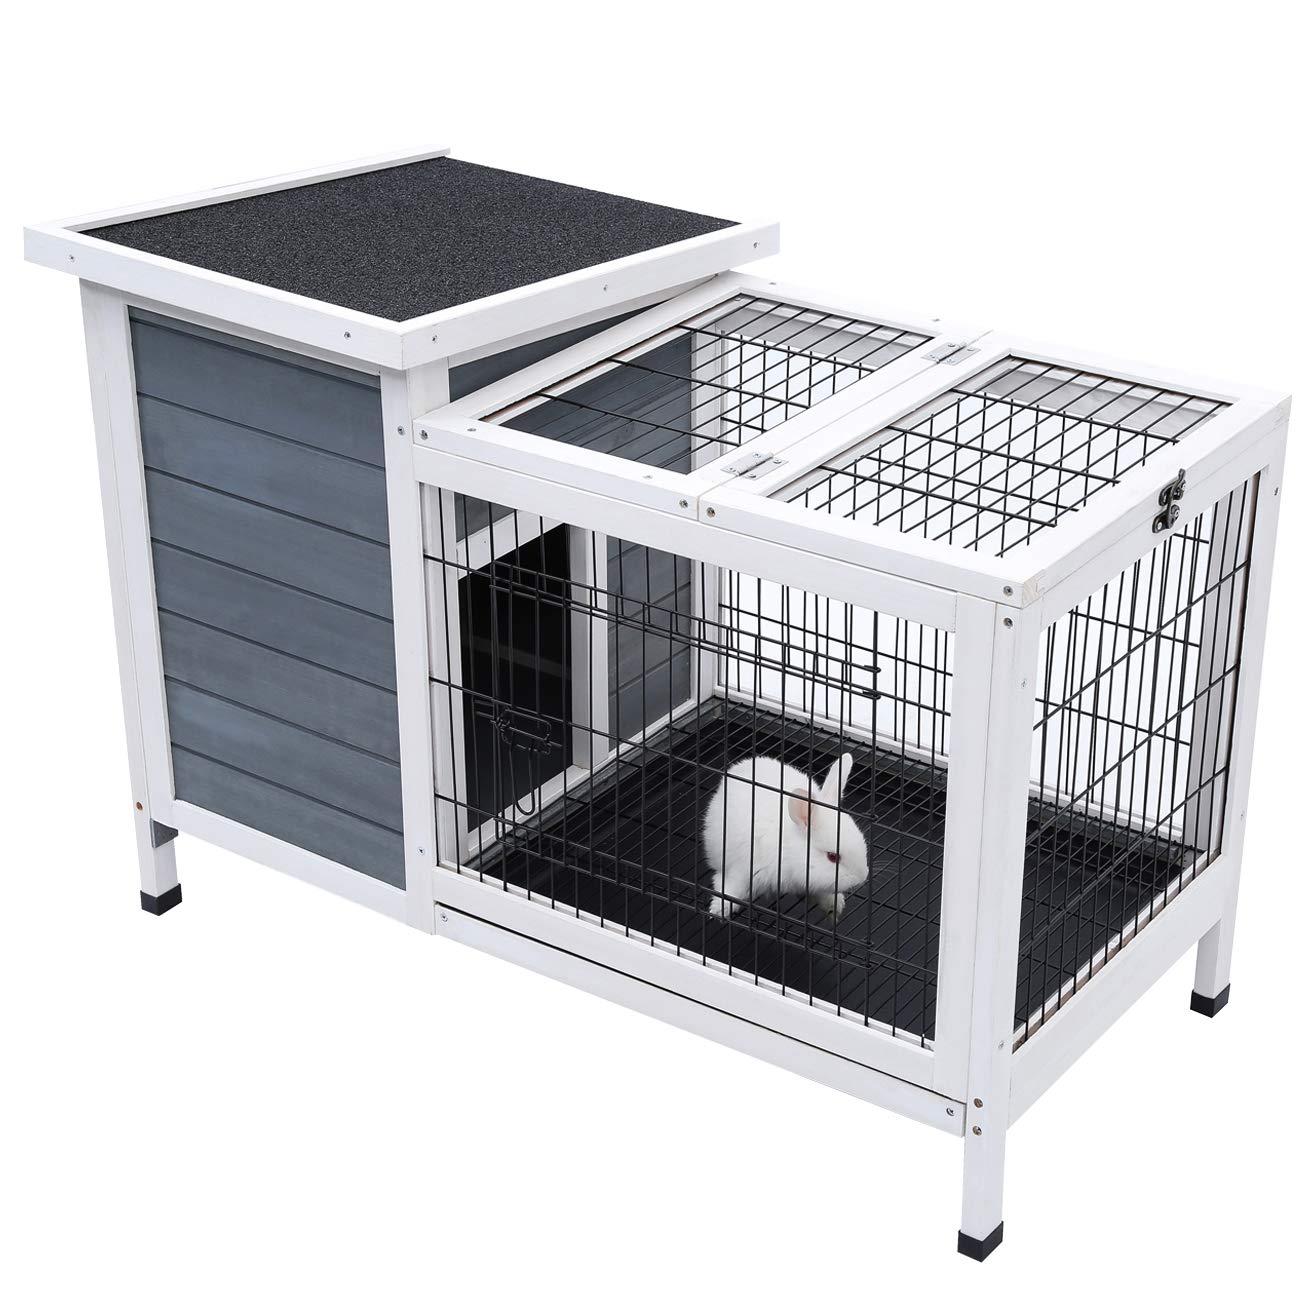 Sunnyglade Rabbit Hutch,Bunny Cage,Bunny Hutch Wood for Indoor Use